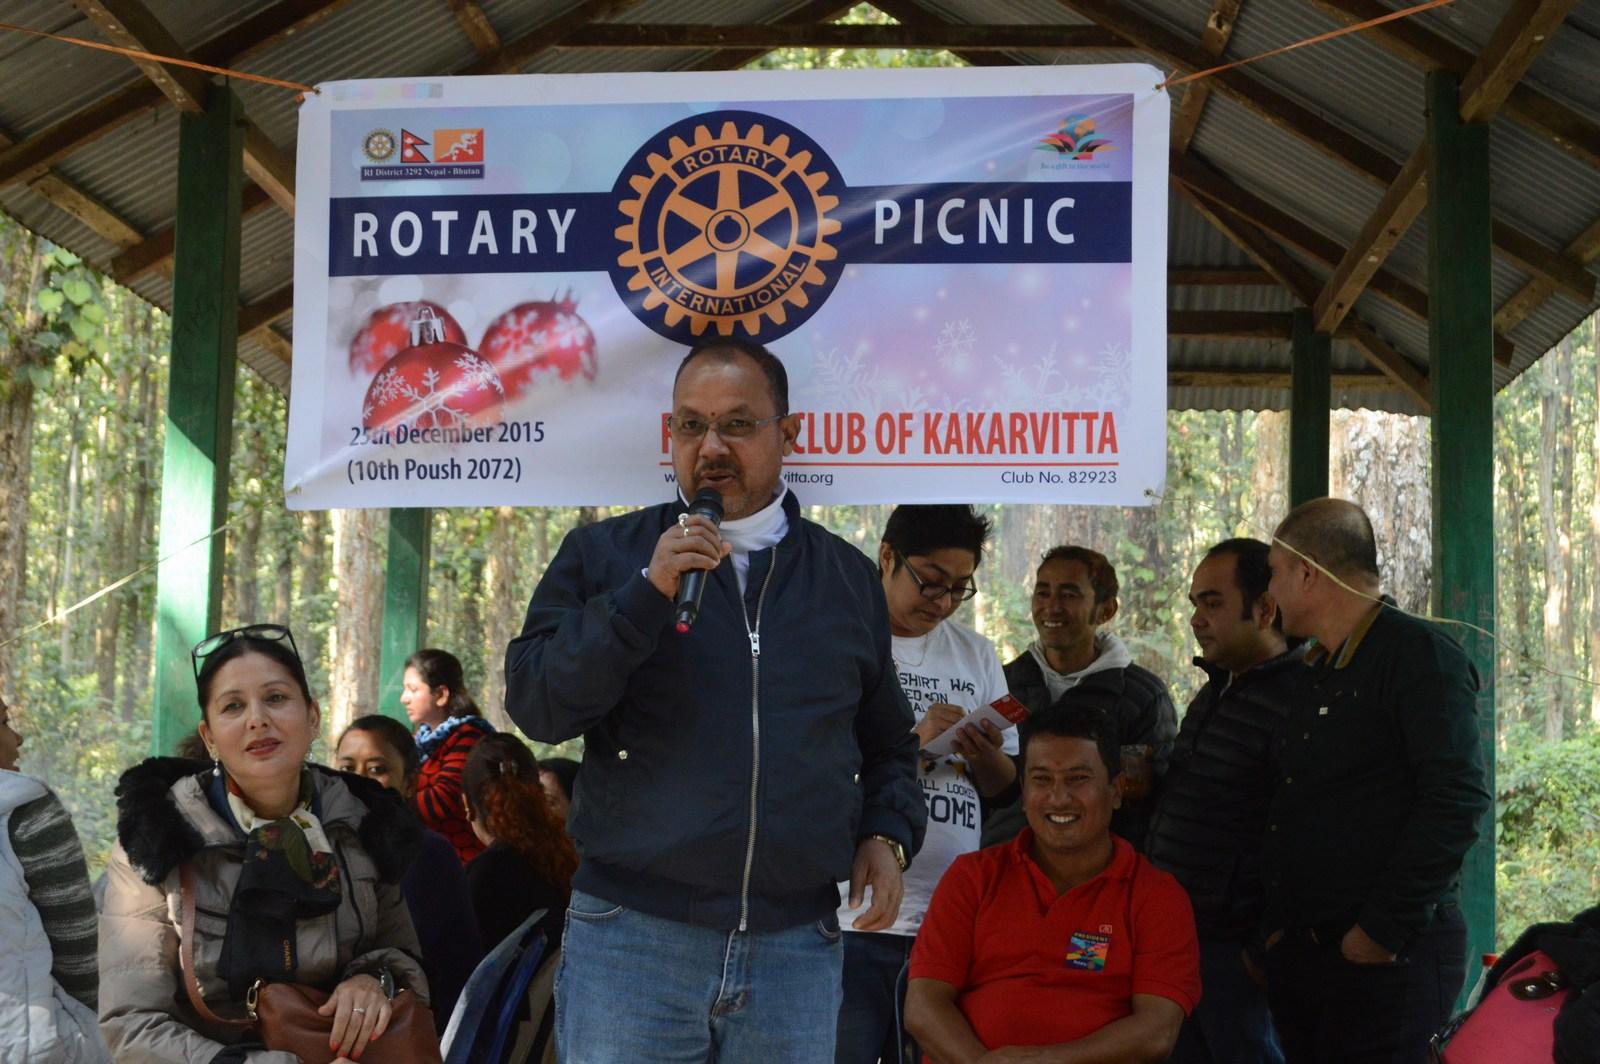 Rota Picnc 2015 56